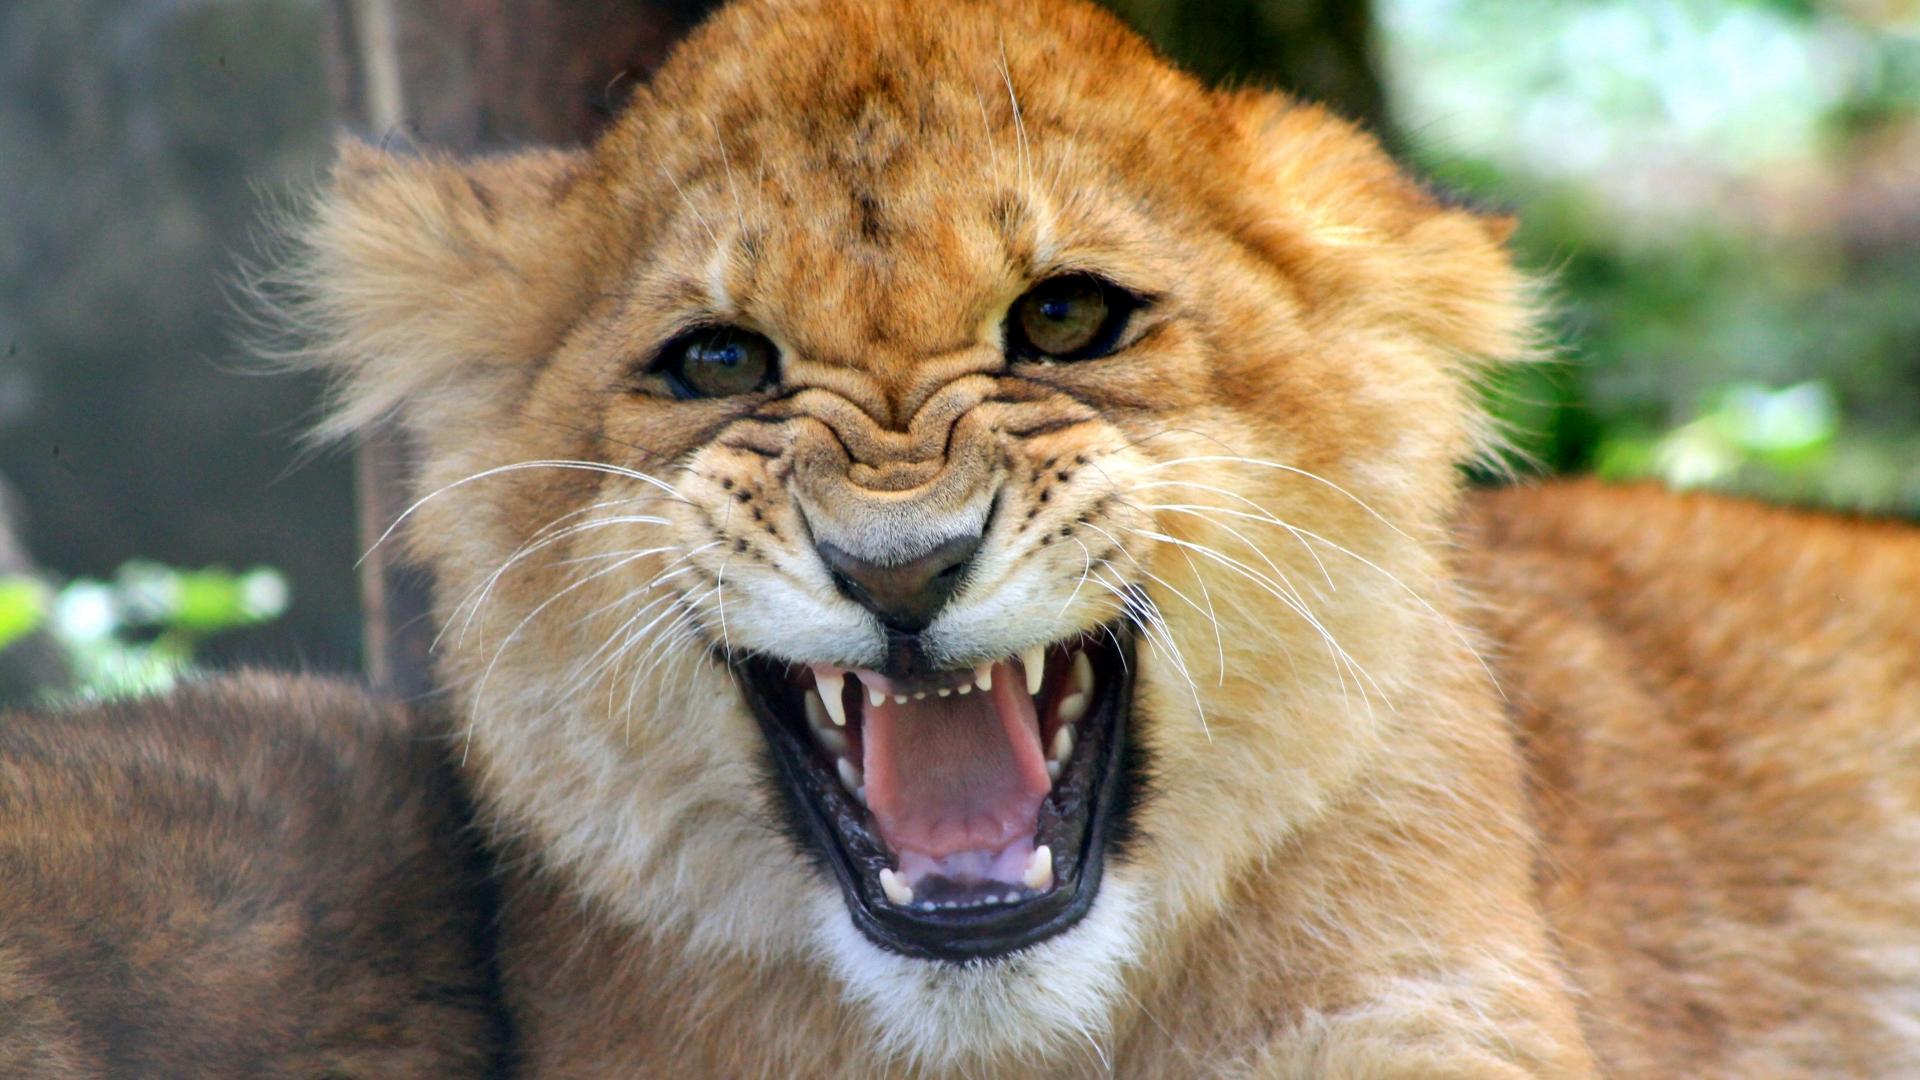 Cachorro león rugiendo - 1920x1080